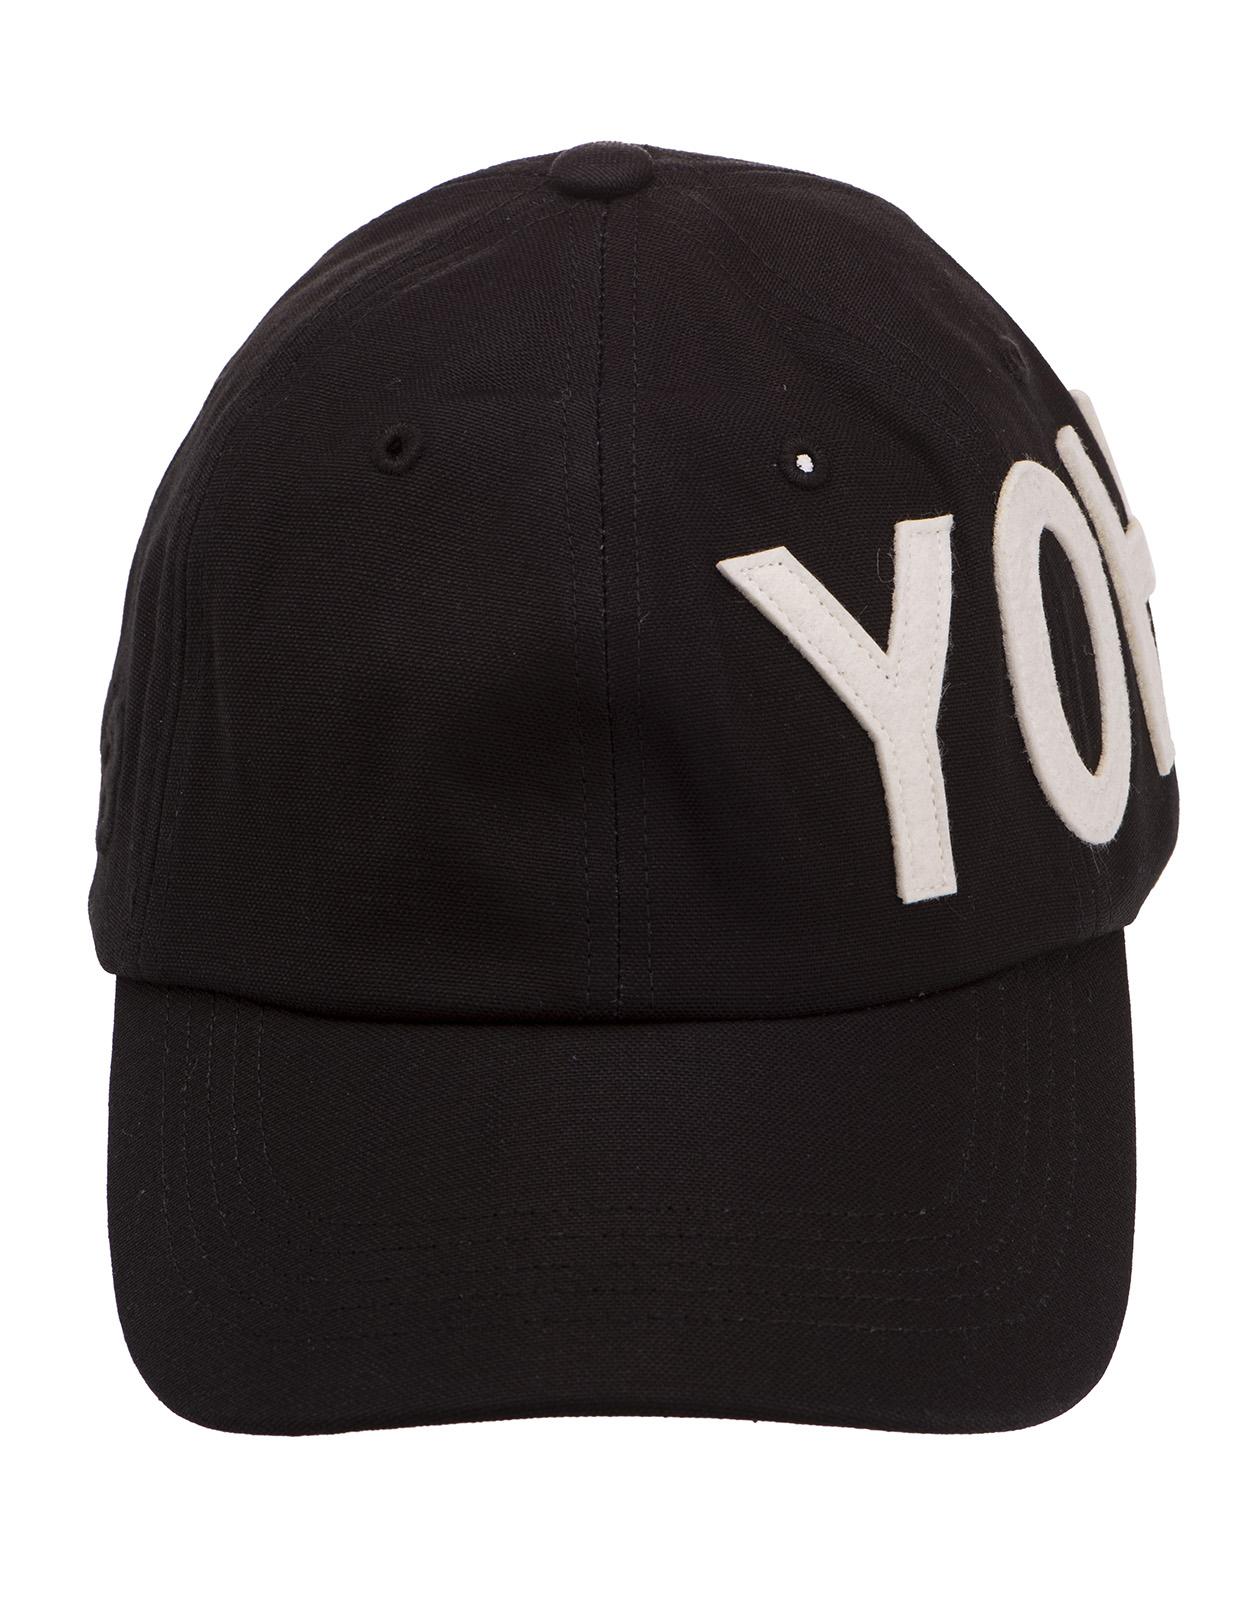 9a25deab Black Baseball Hat With White YOHJI Signature - ADIDAS - Russocapri